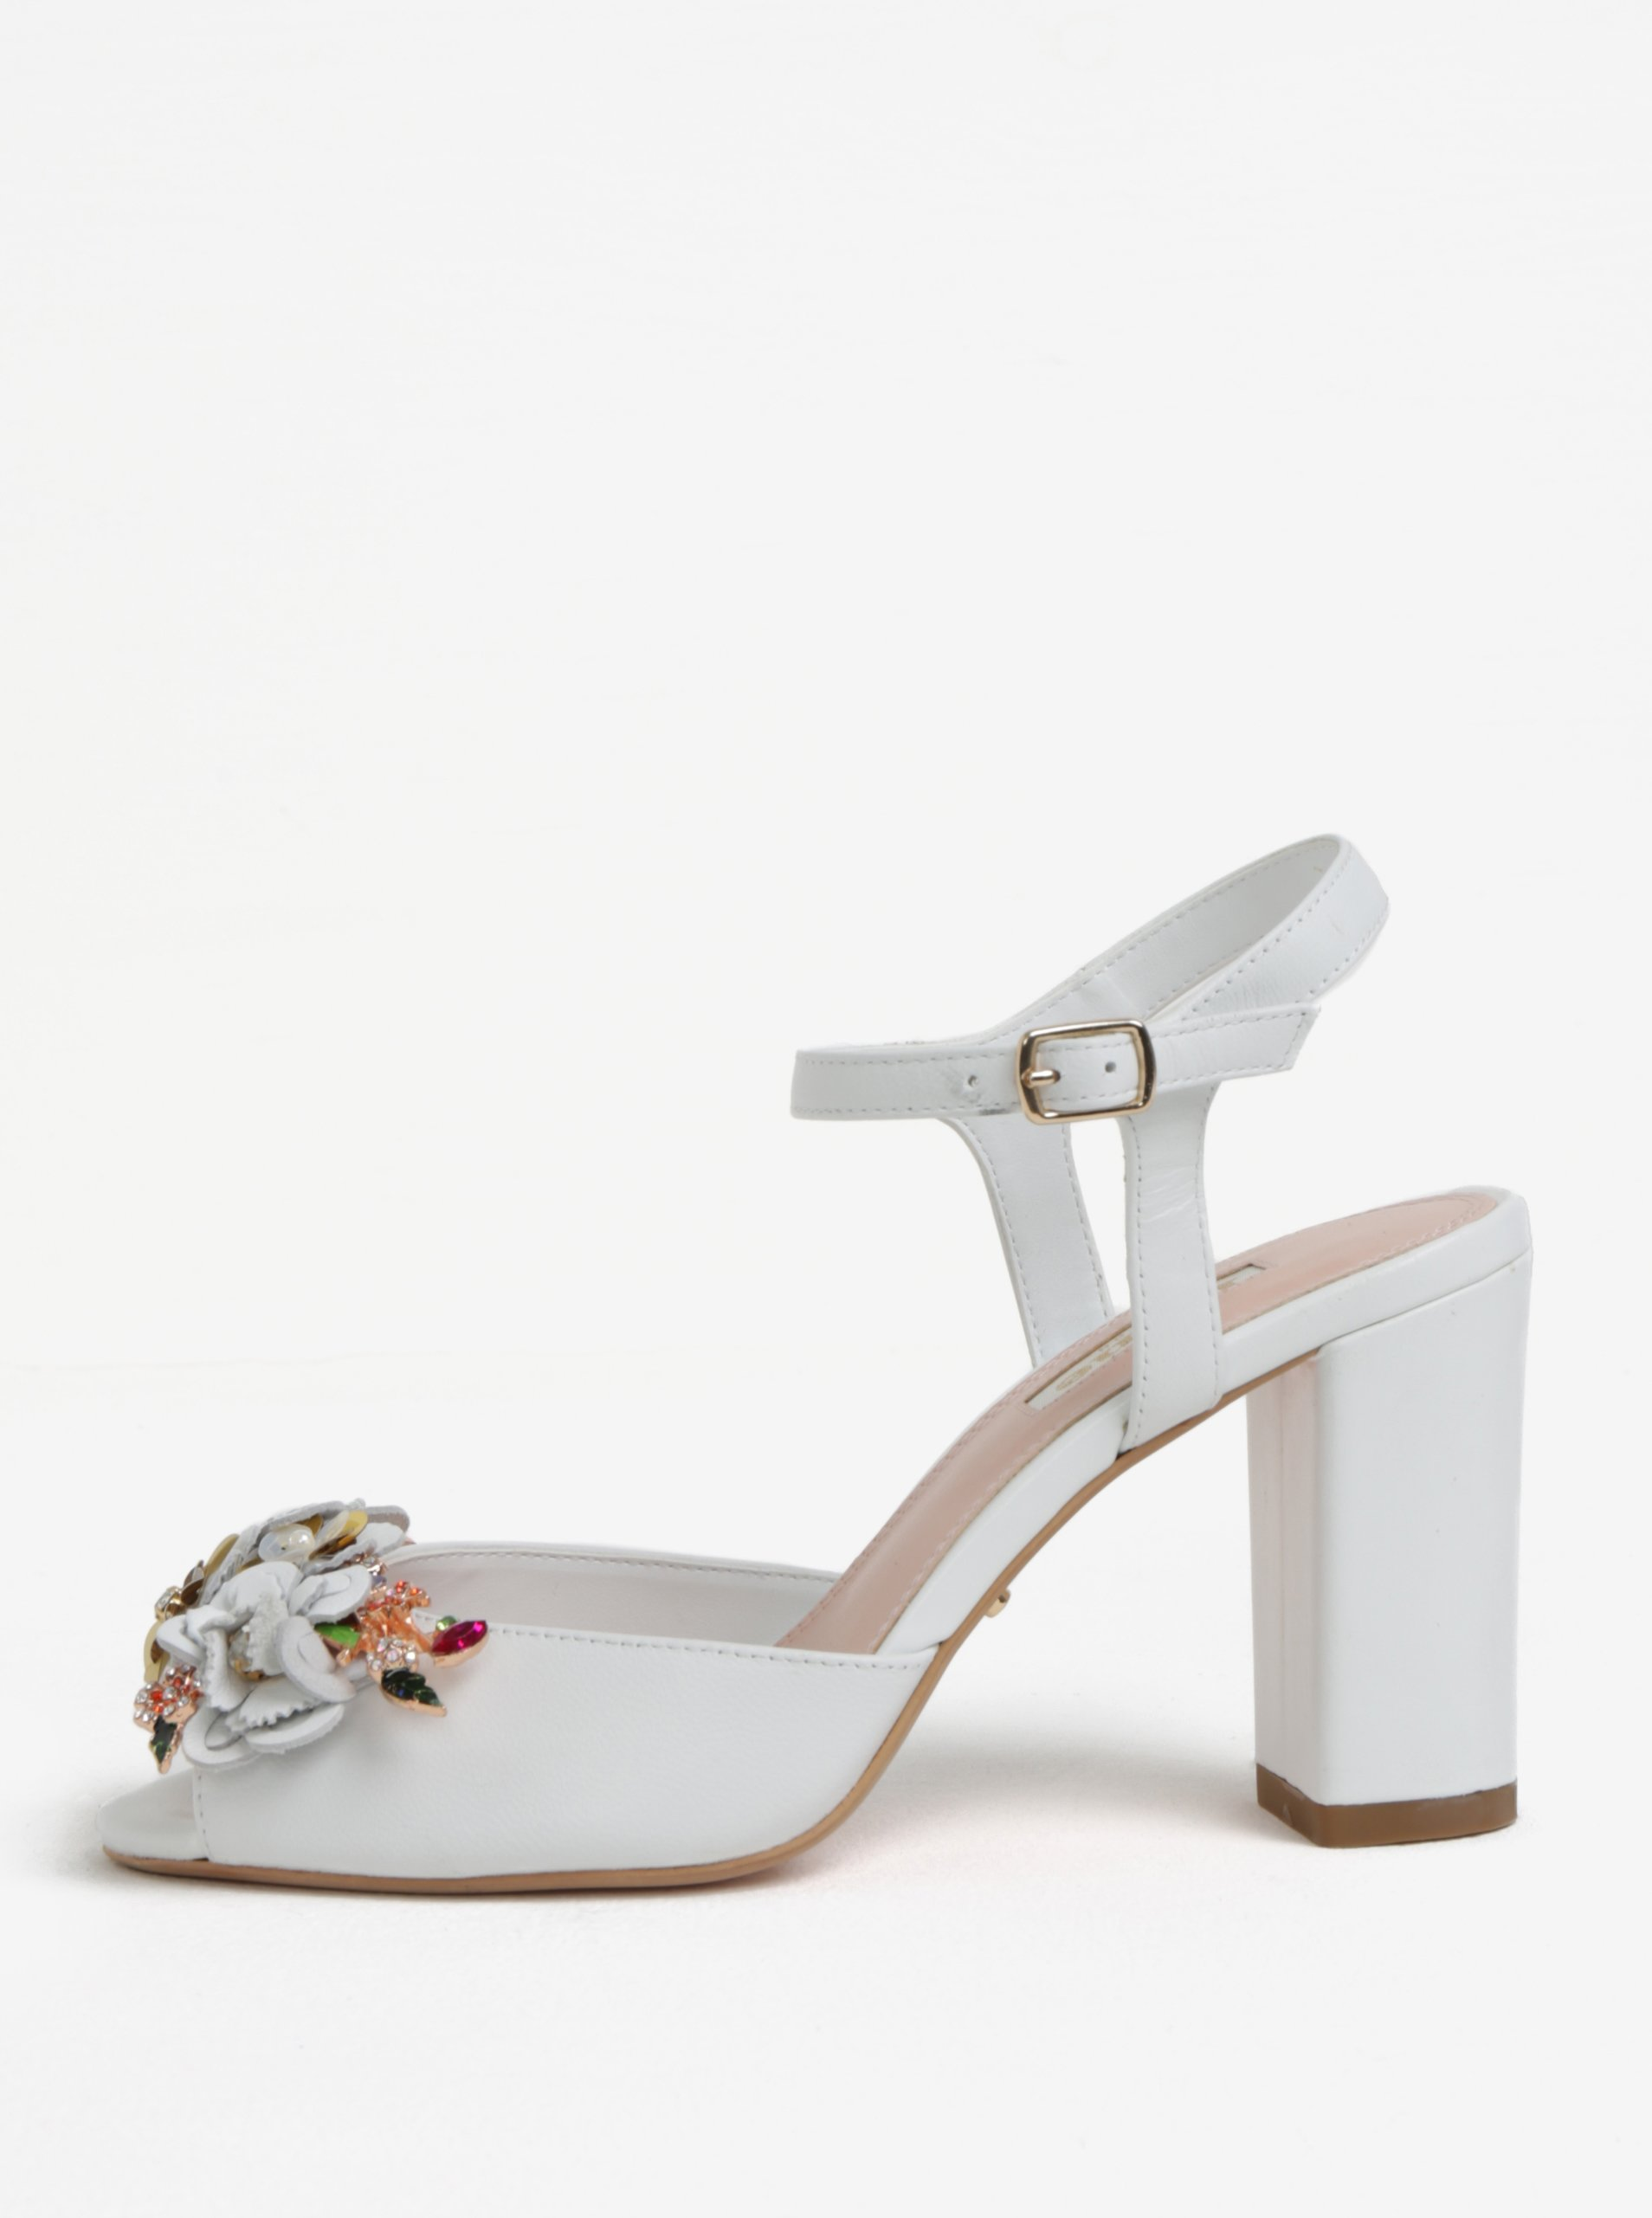 4c26d0632 Biele kožené sandáliky na podpätku Dune London Mackaya | Moda.sk